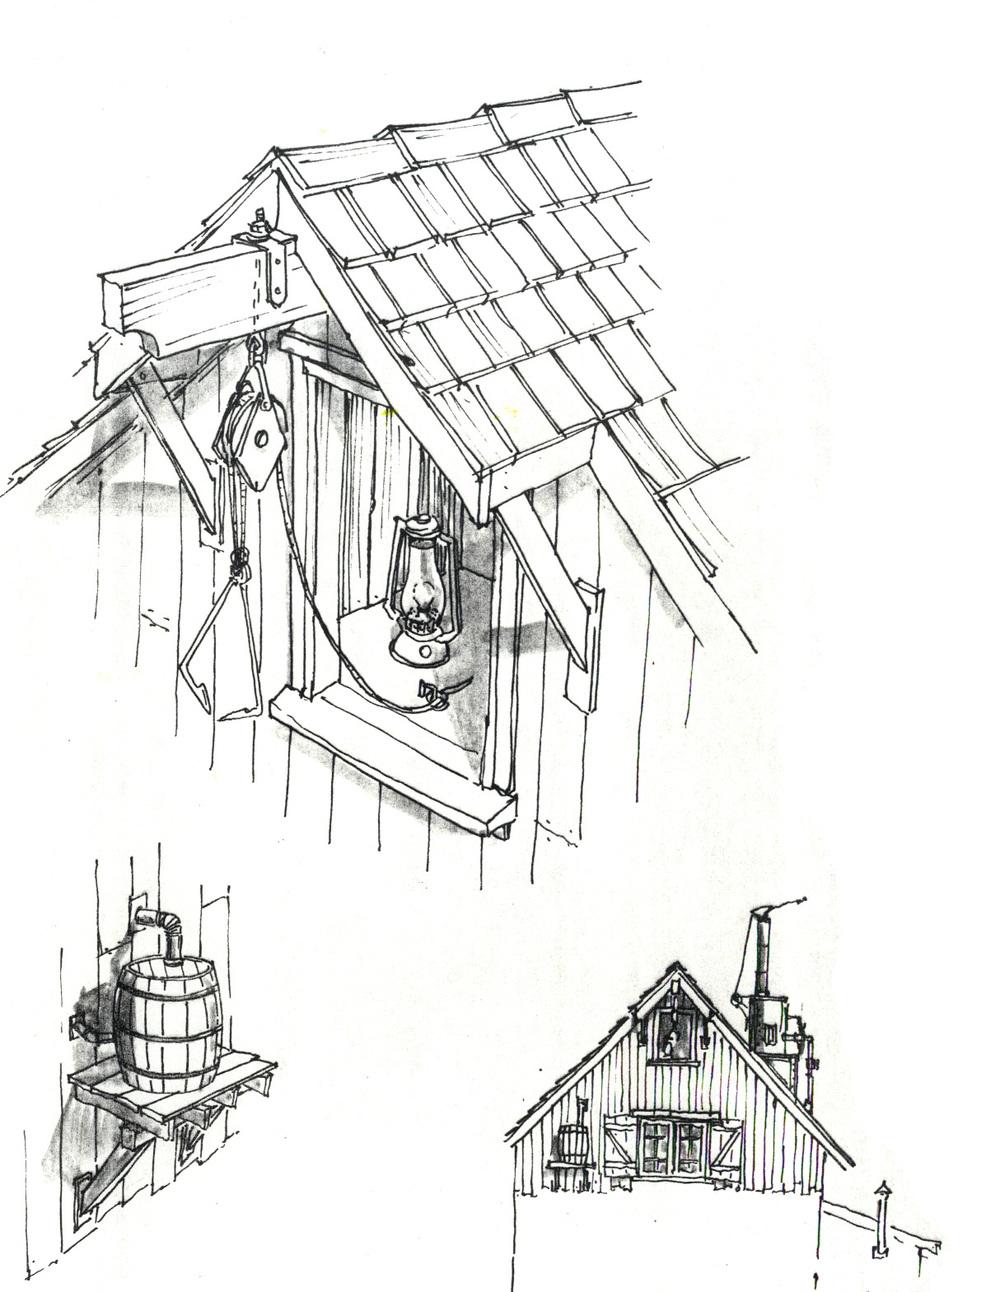 roof details 02 7594513386[K].jpg